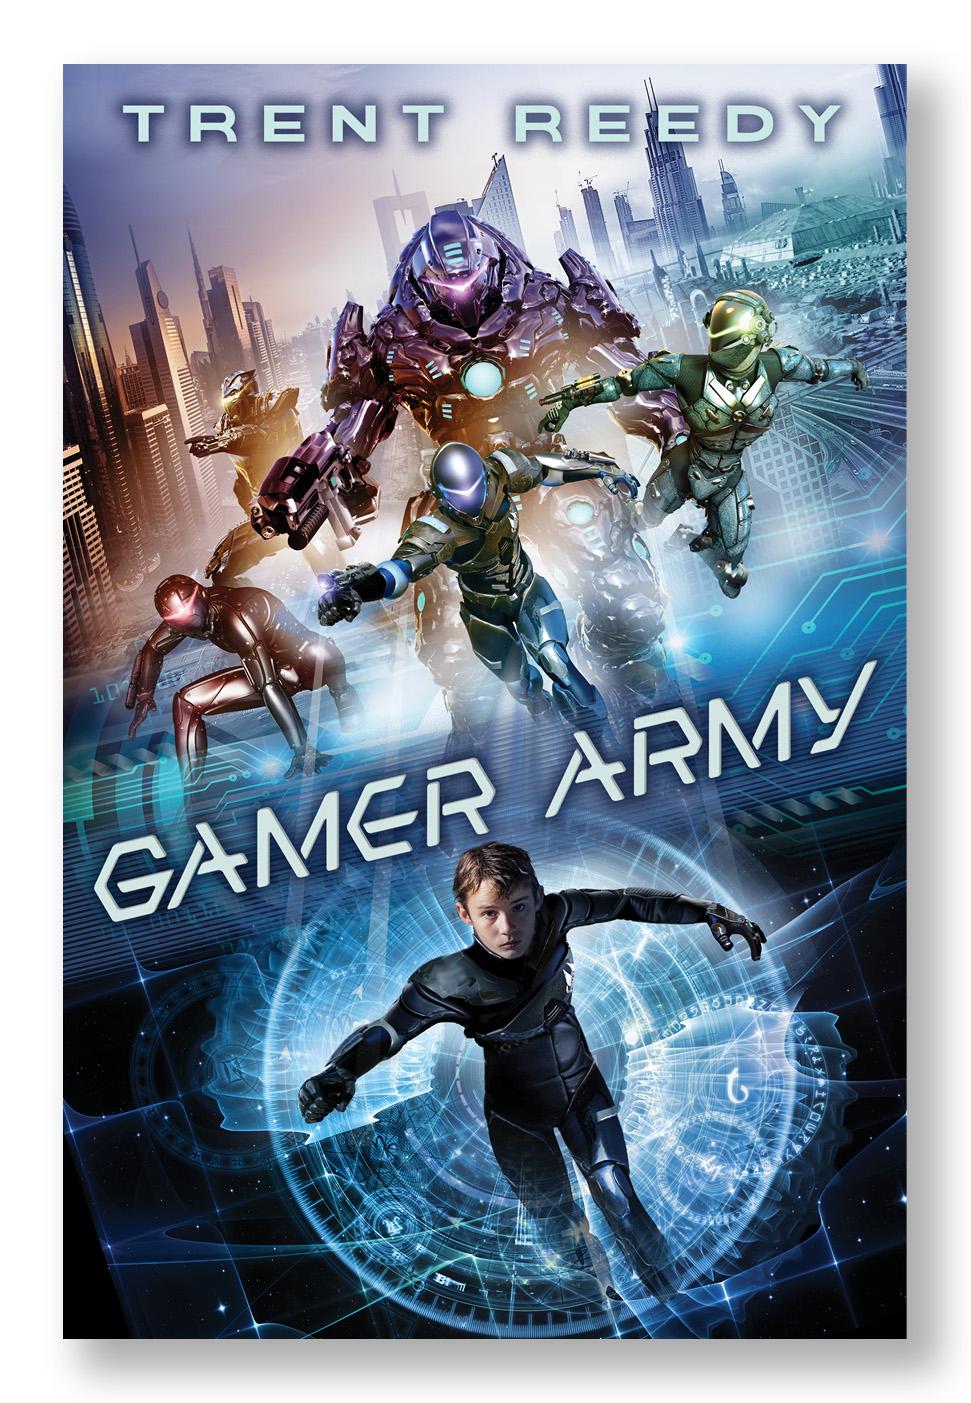 Gamer Army.jpg